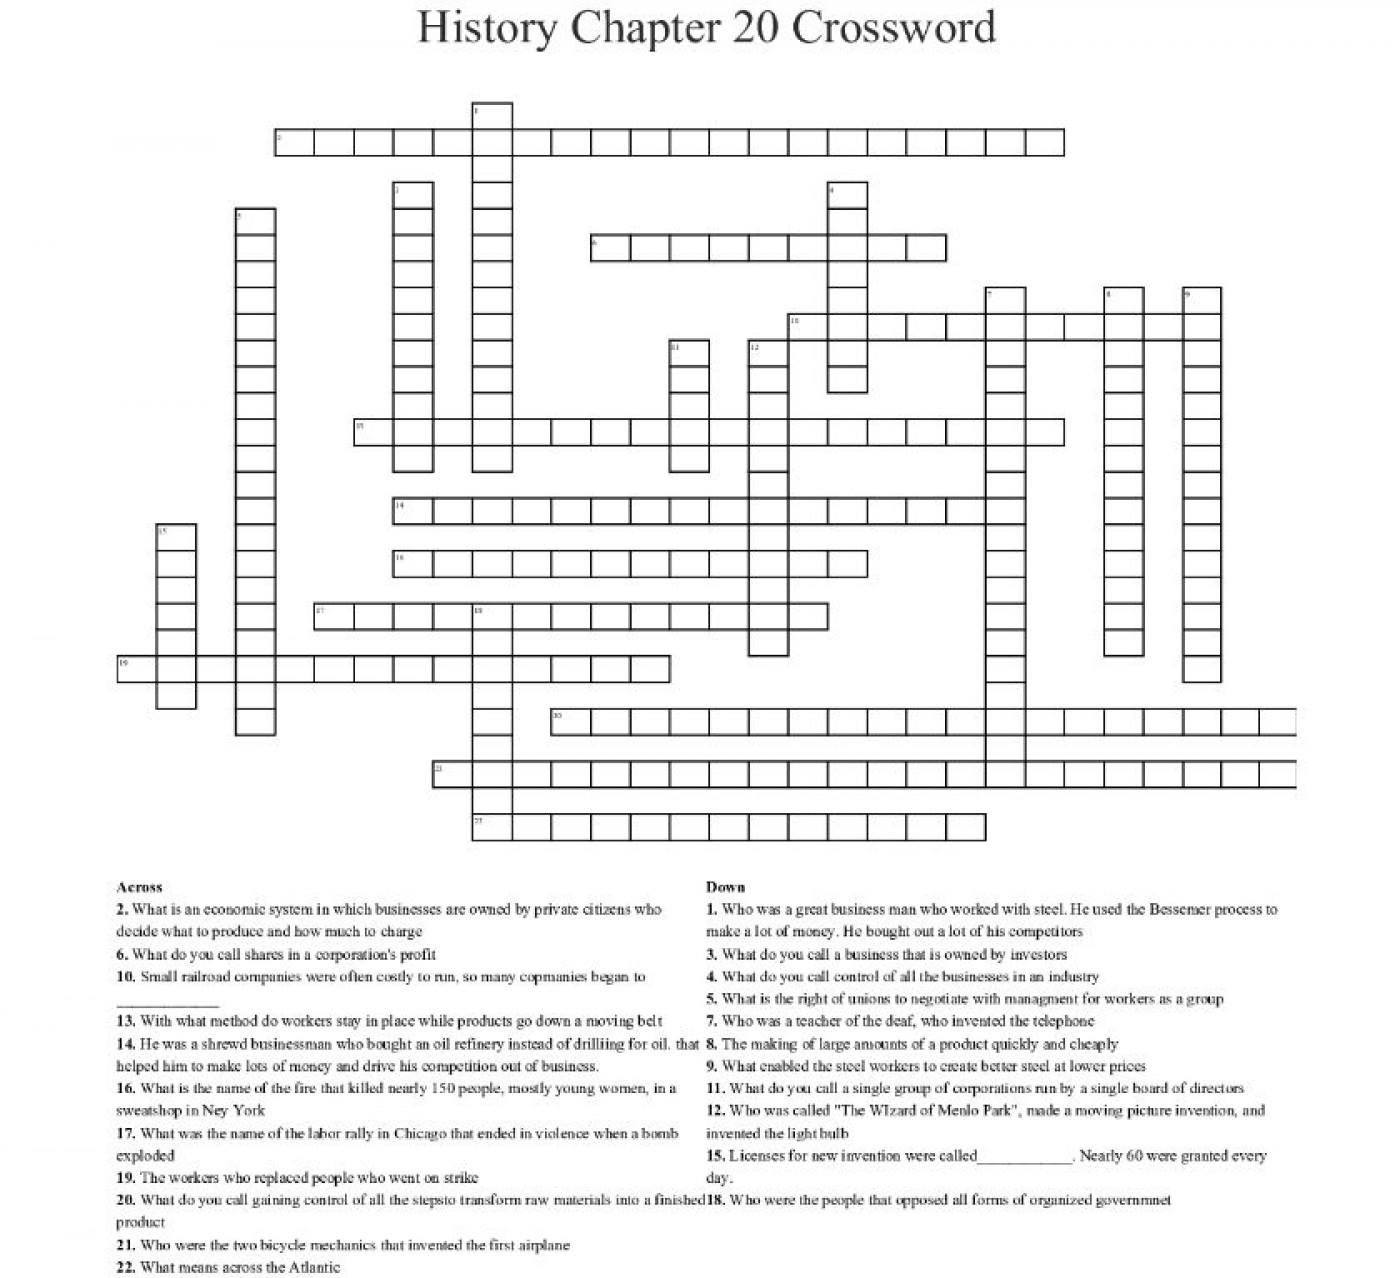 002 Frightening Prosperity Crossword Sample  Hollow Sound Of Sudden Clue Material 7 Letter1400